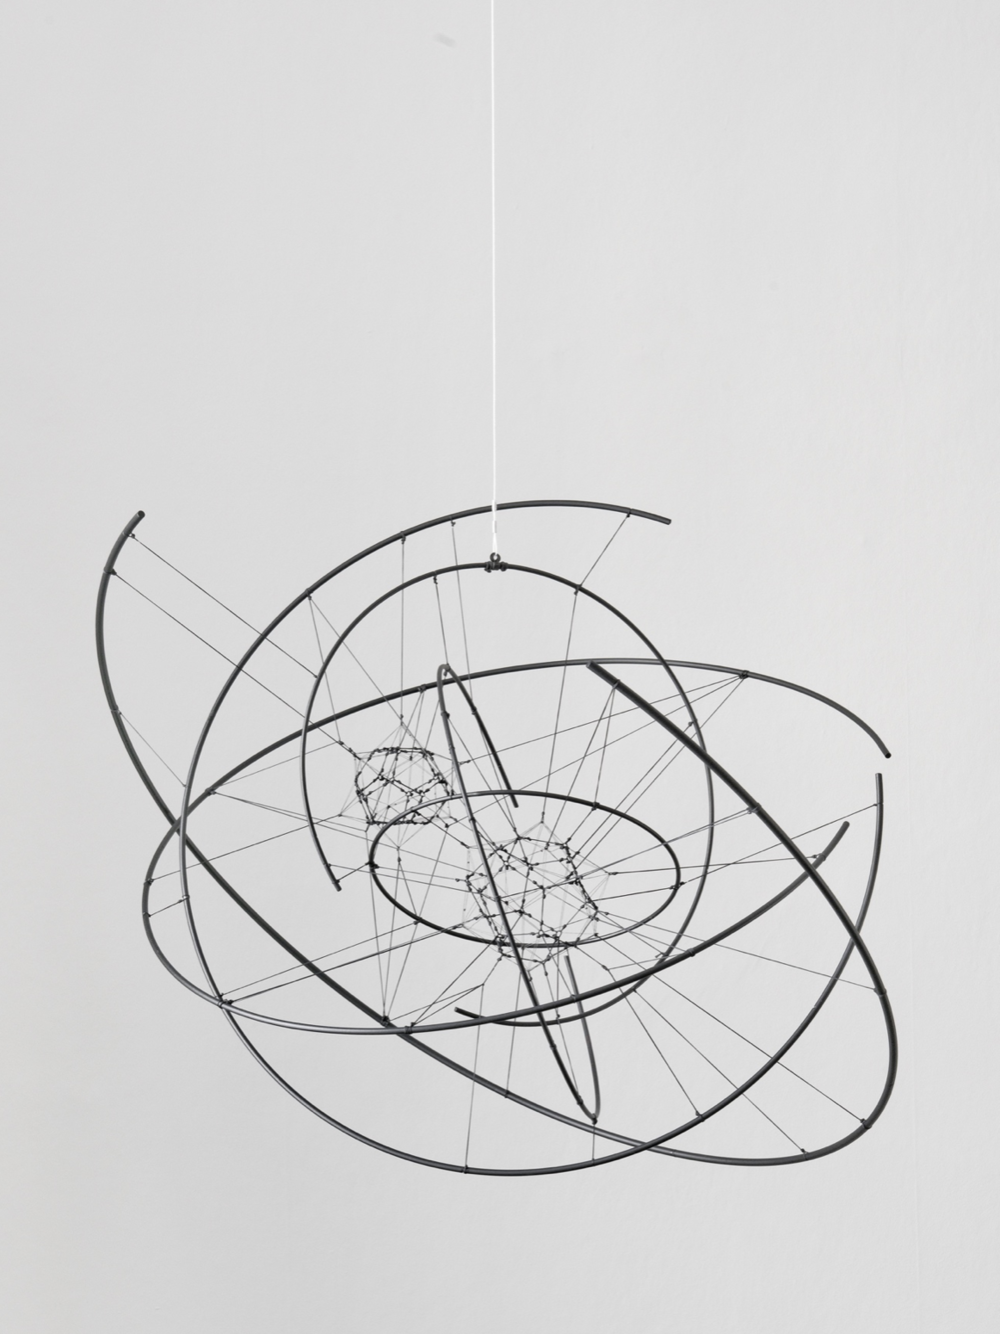 Tomás Saraceno - Zonal Harmonic 2N 60/6, 2017, Carbon fibre, rope, glue